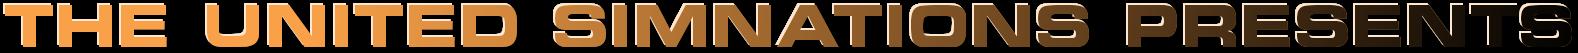 u.s.n.logo1.png.png?psid=1